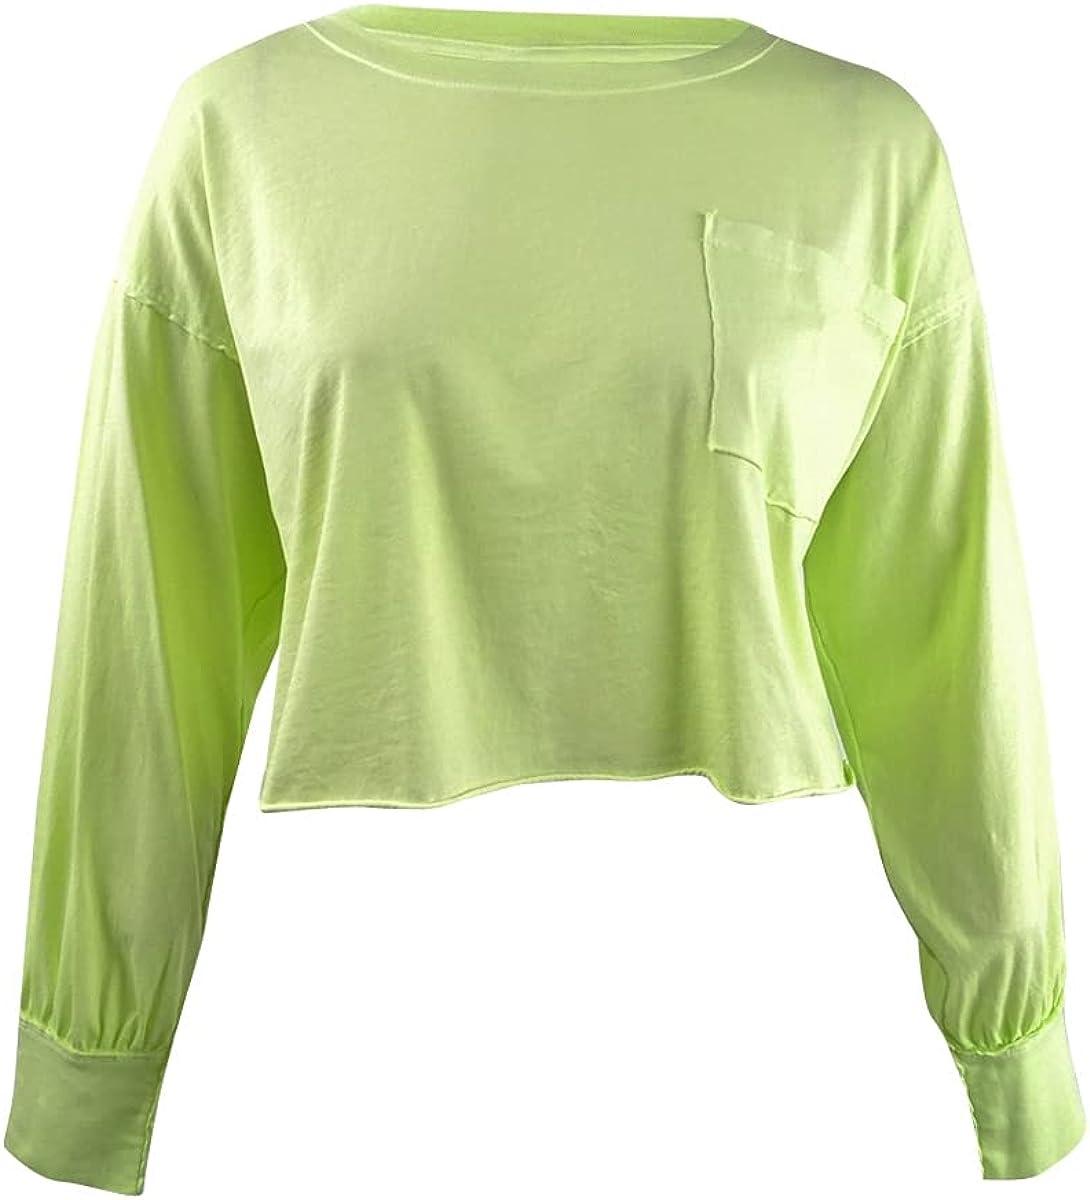 Free People Women's Austin Long Sleeve Shirt Yellow L